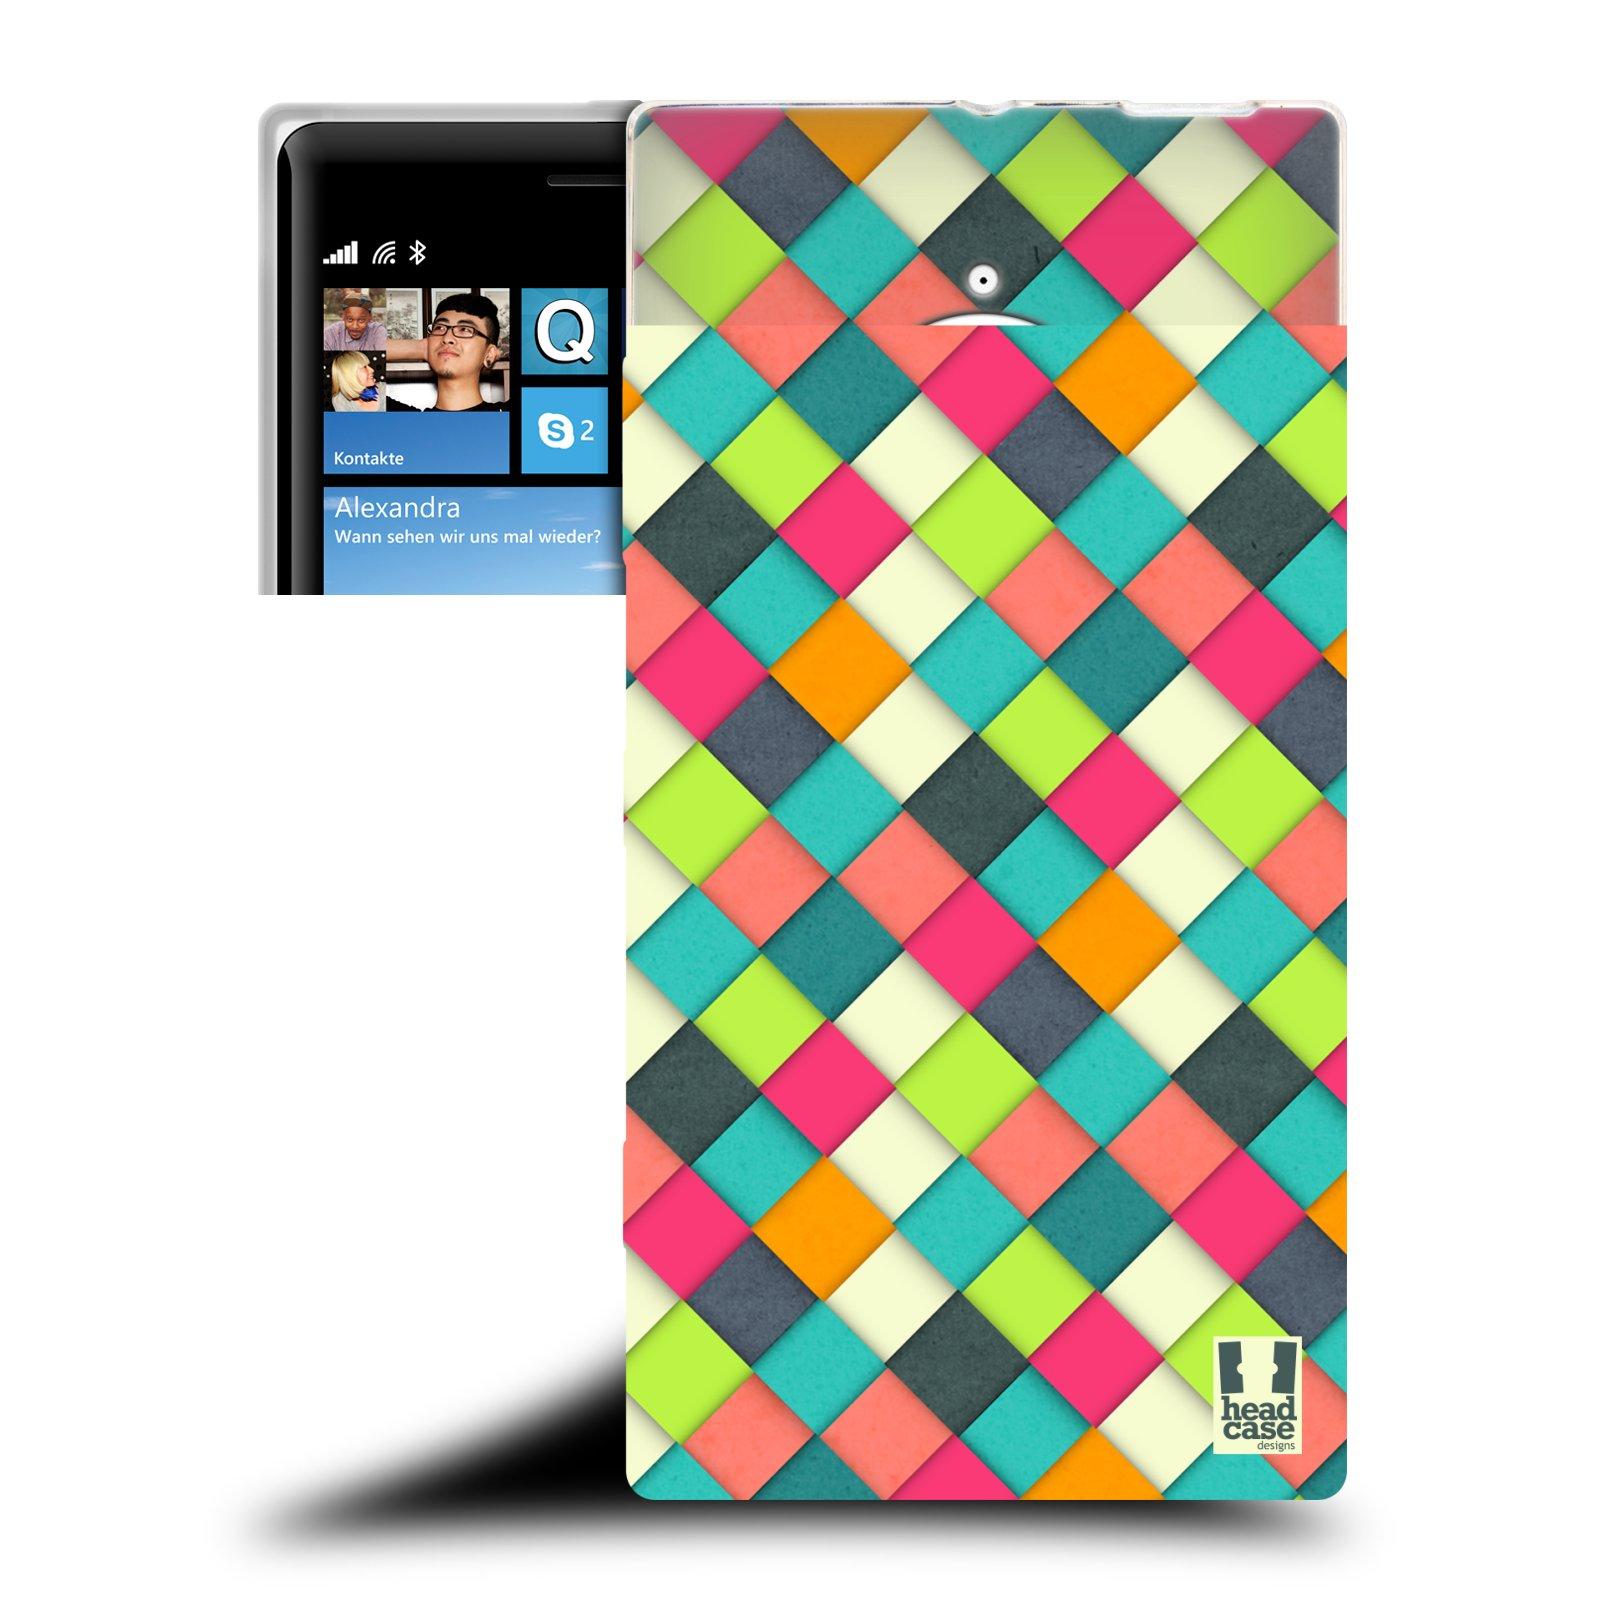 Silikonové pouzdro na mobil Nokia Lumia 830 HEAD CASE WOVEN (Silikonový kryt či obal na mobilní telefon Nokia Lumia 830)